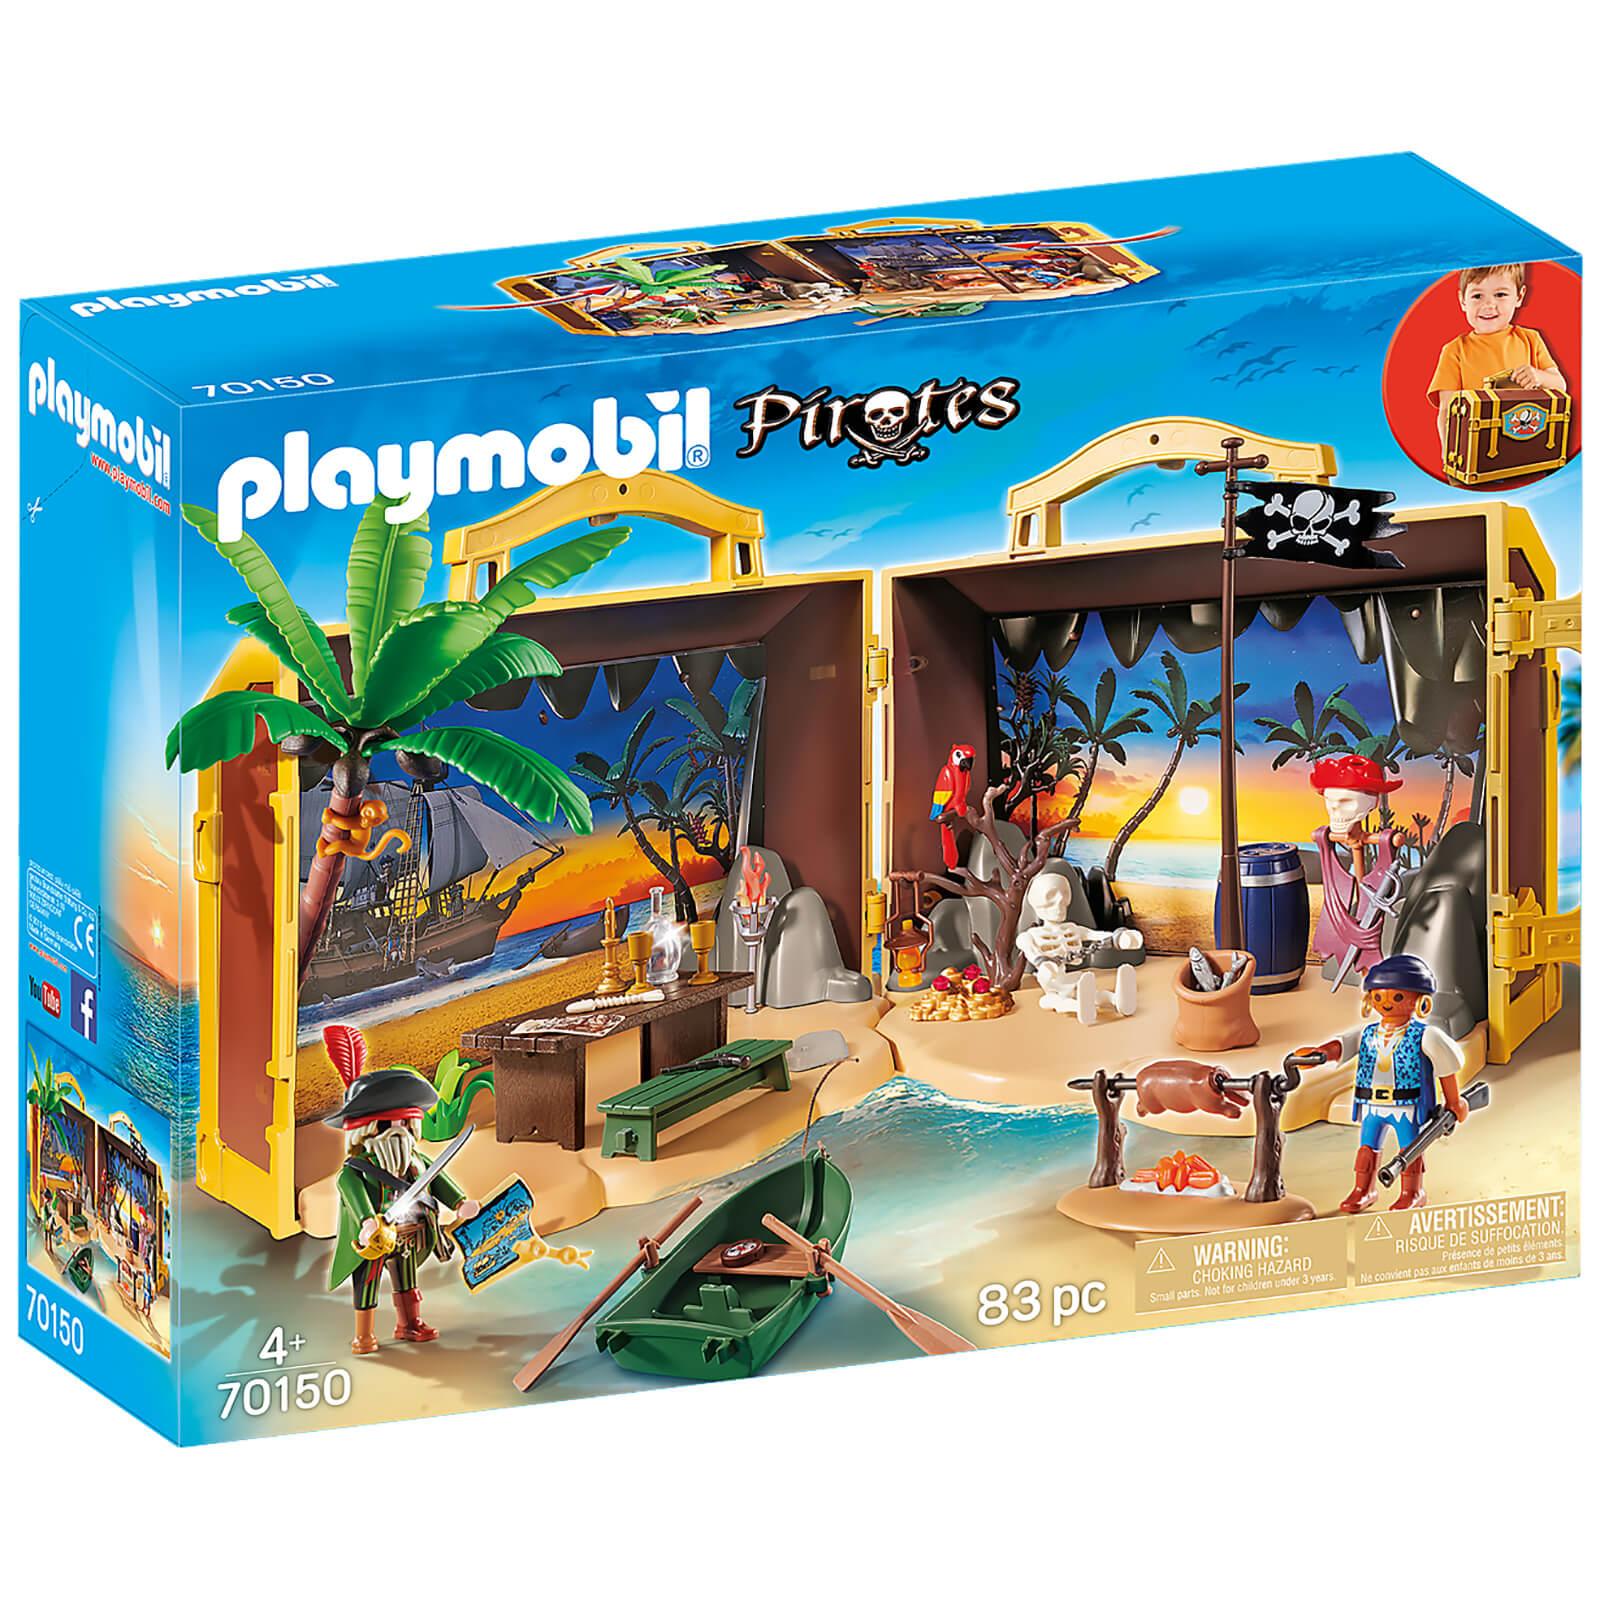 Playmobil Pirates Take Along Pirate Island (70150)